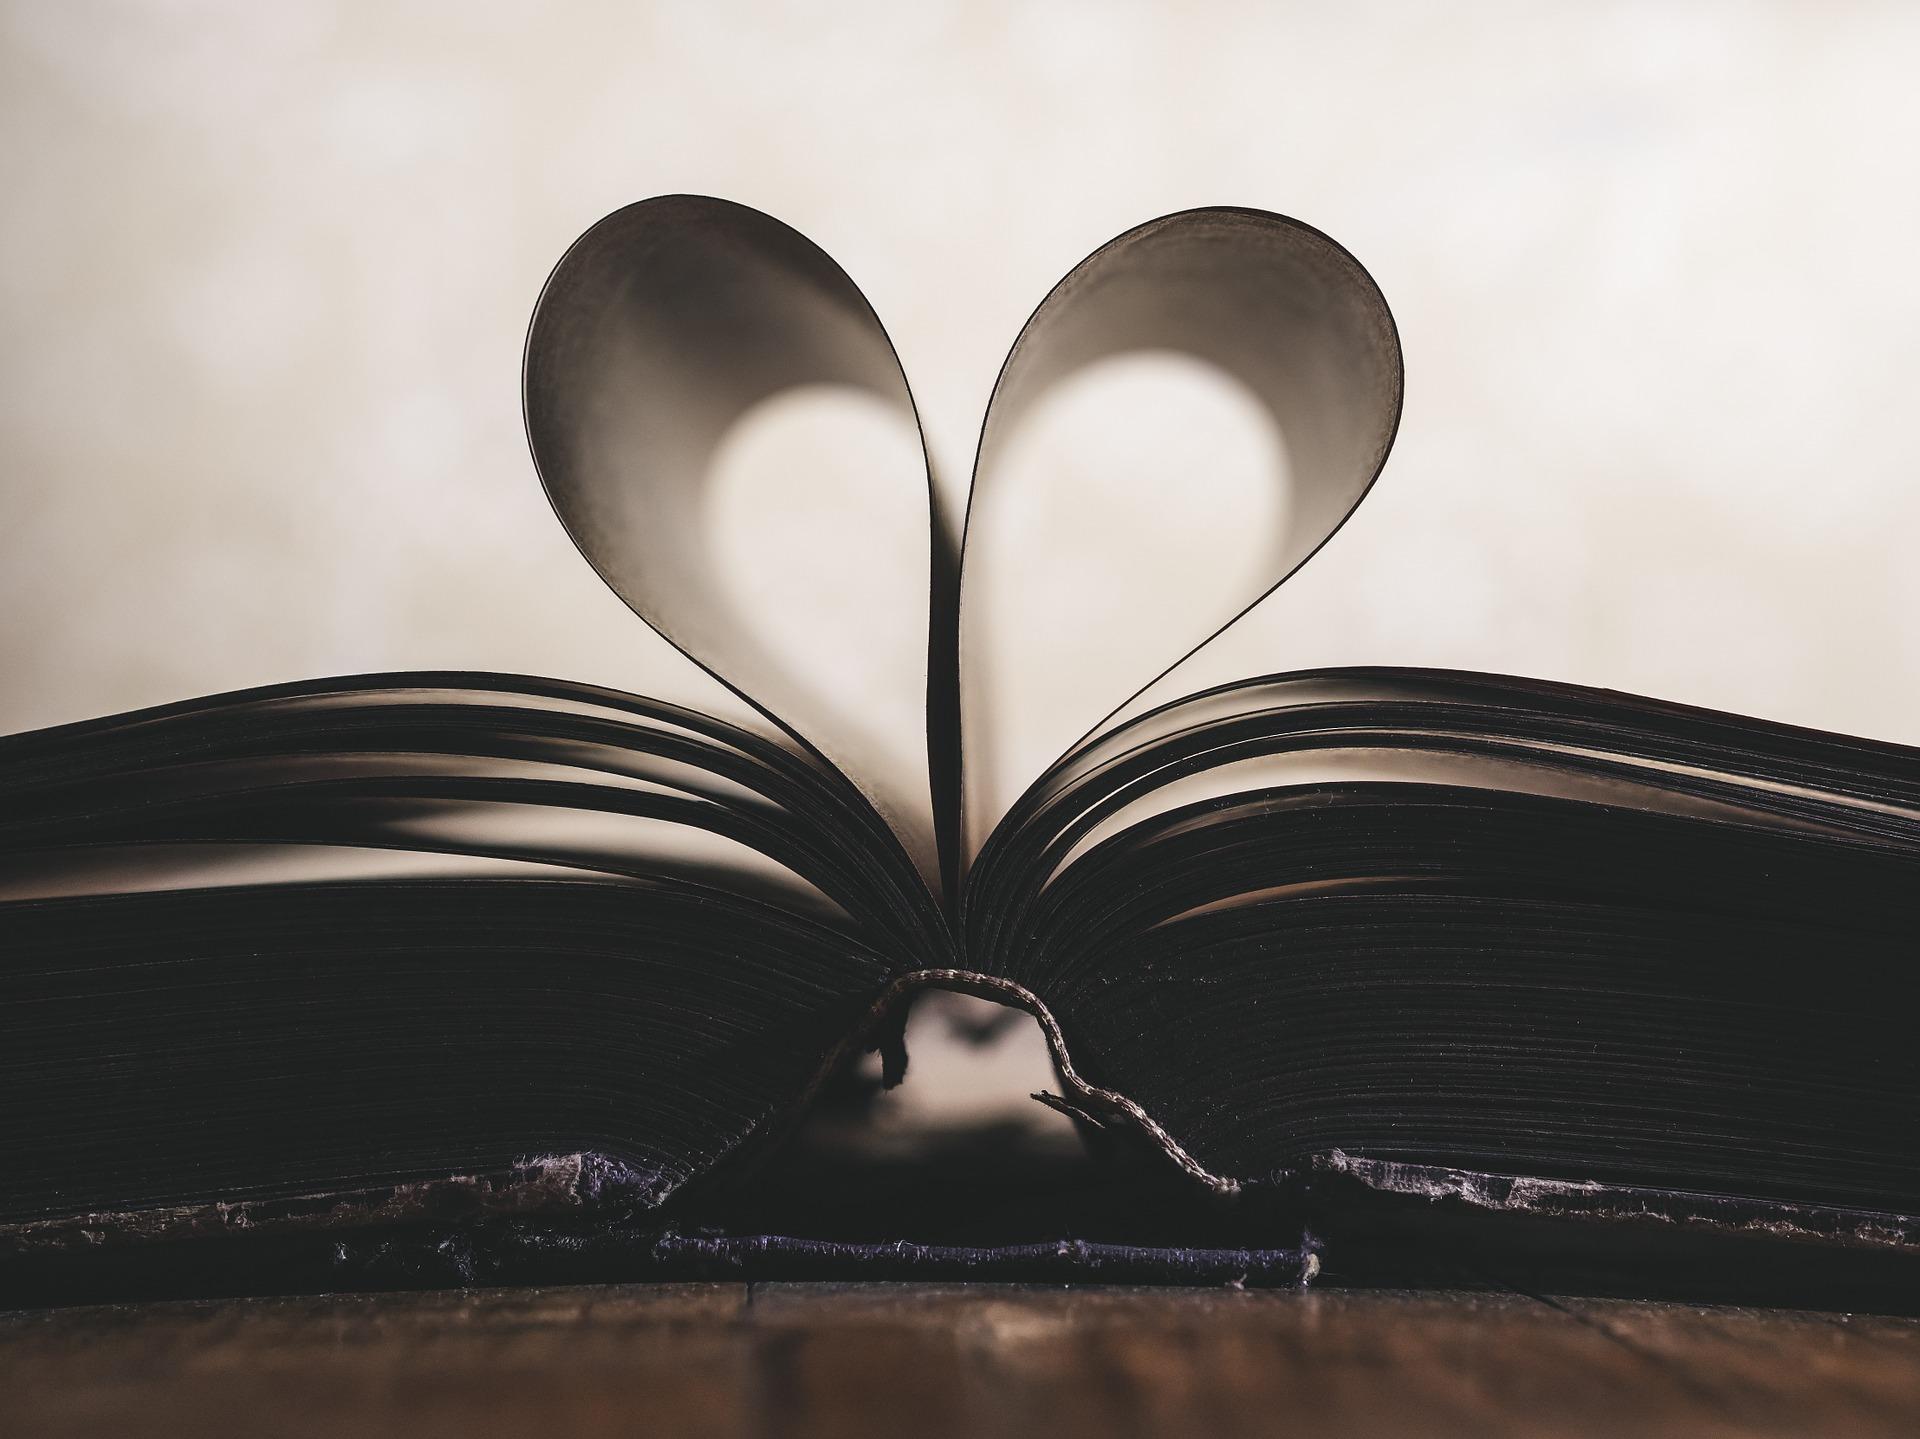 saint-valentin-donner-son-coeur